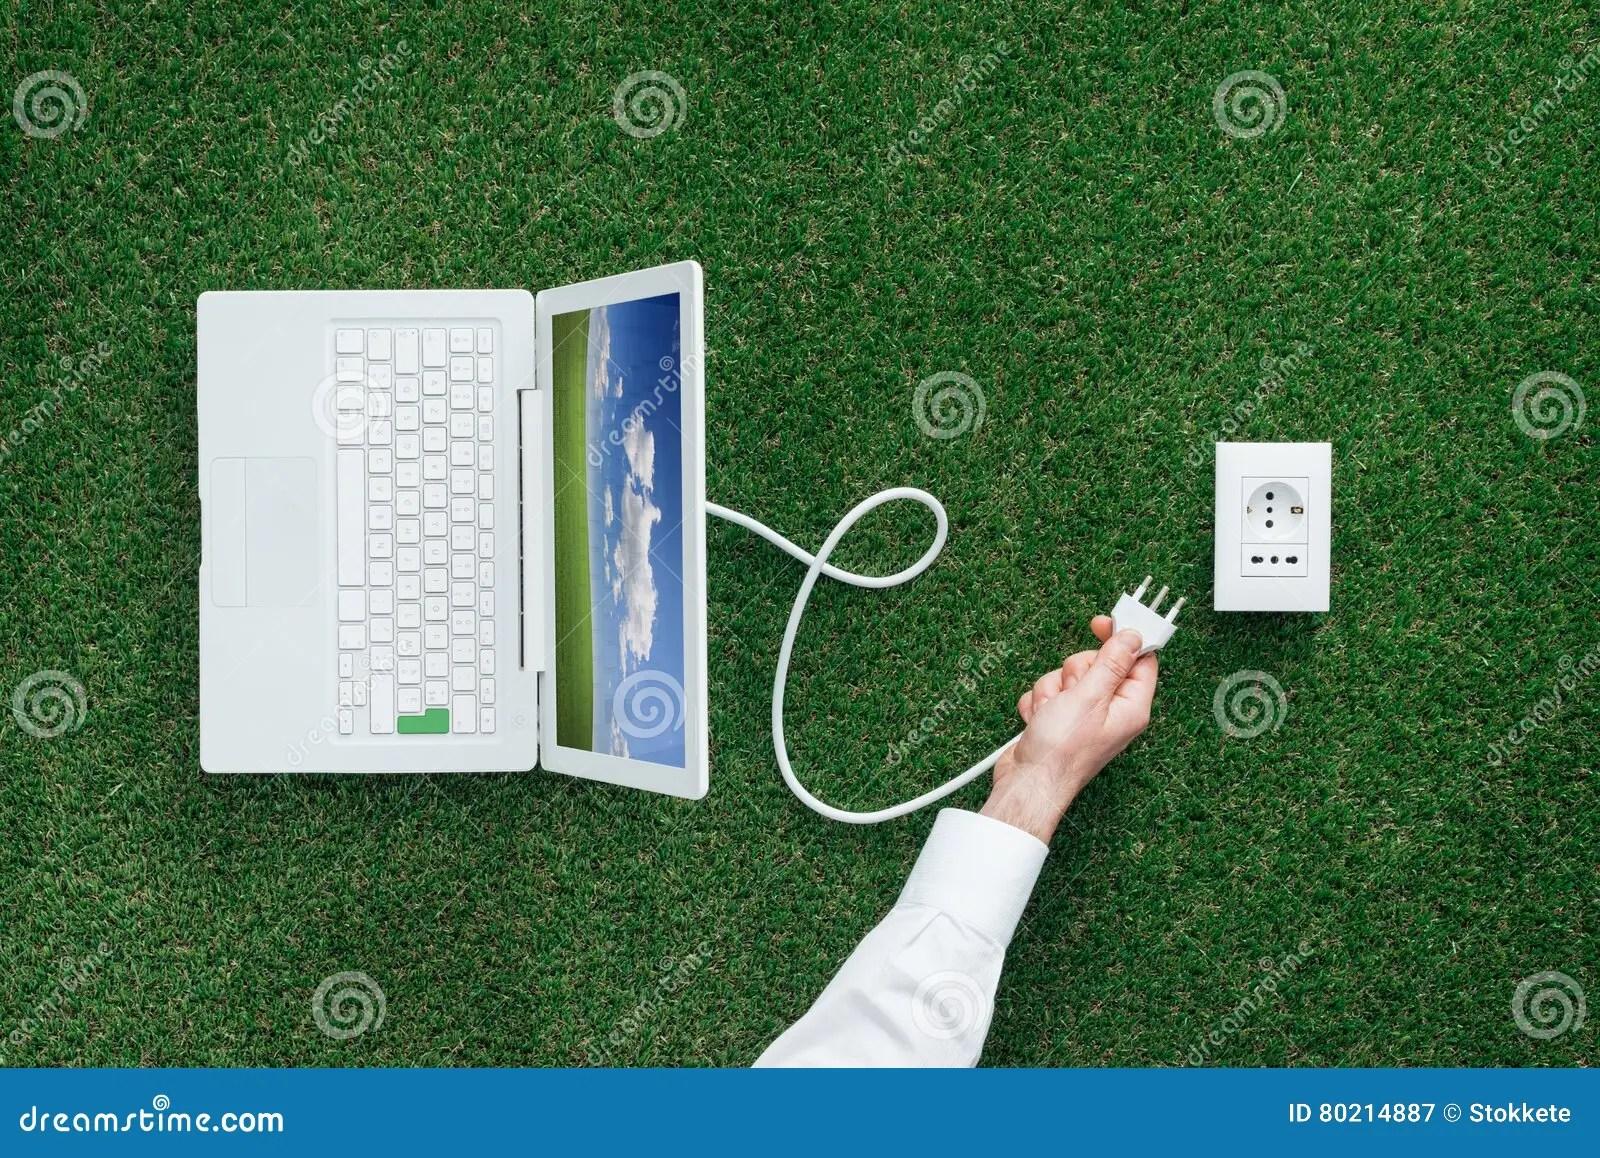 Alternative Energy Sources Stock Image Image Of Laptop